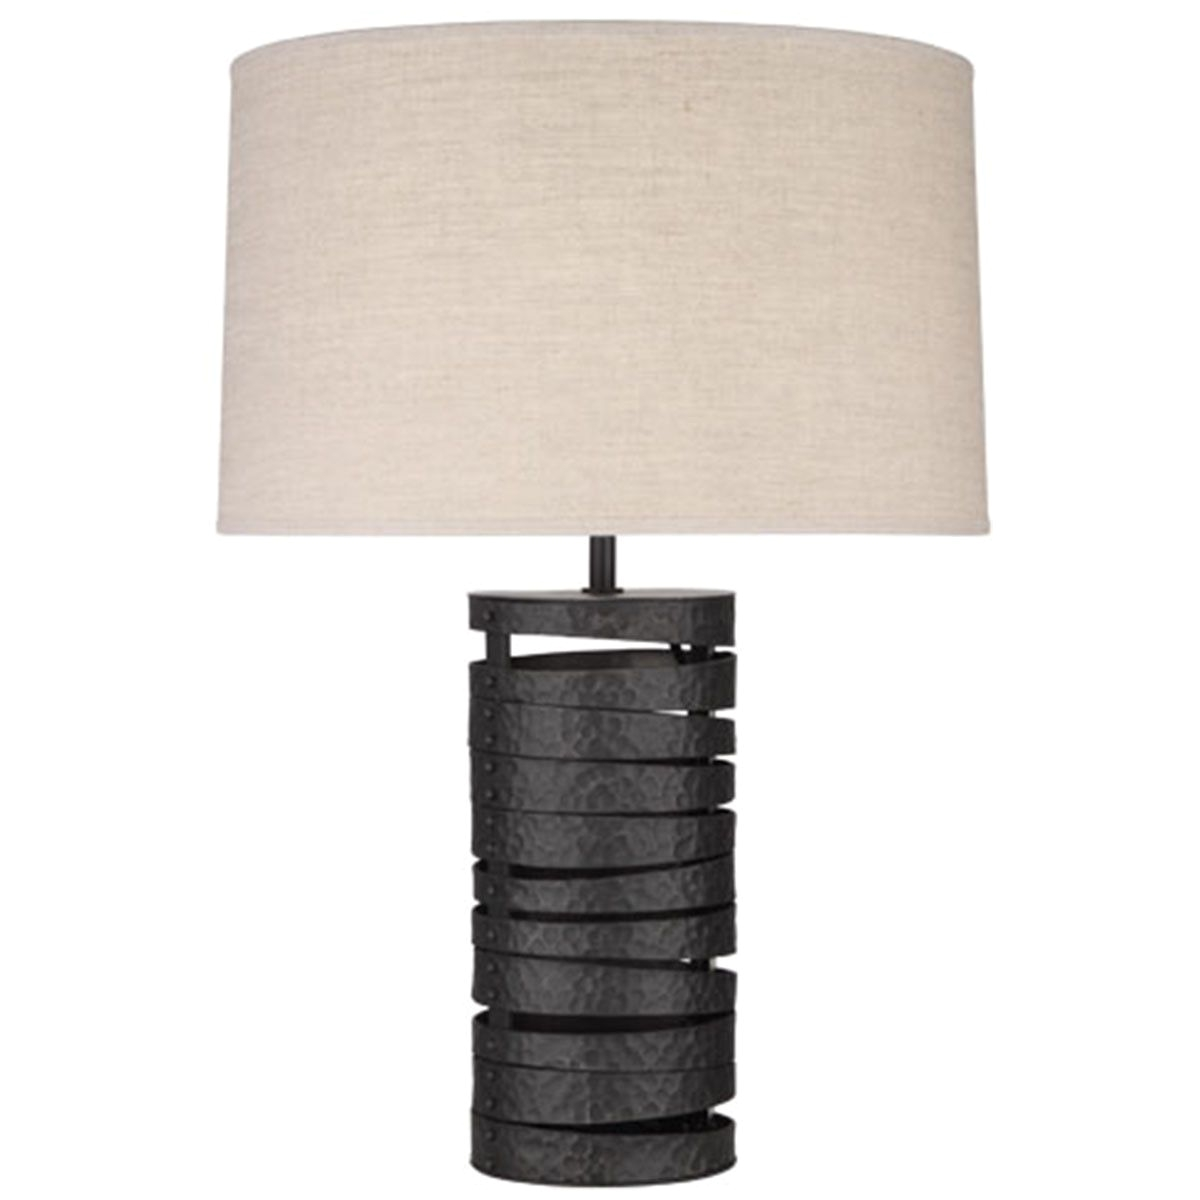 robert abbey trenton table lamp